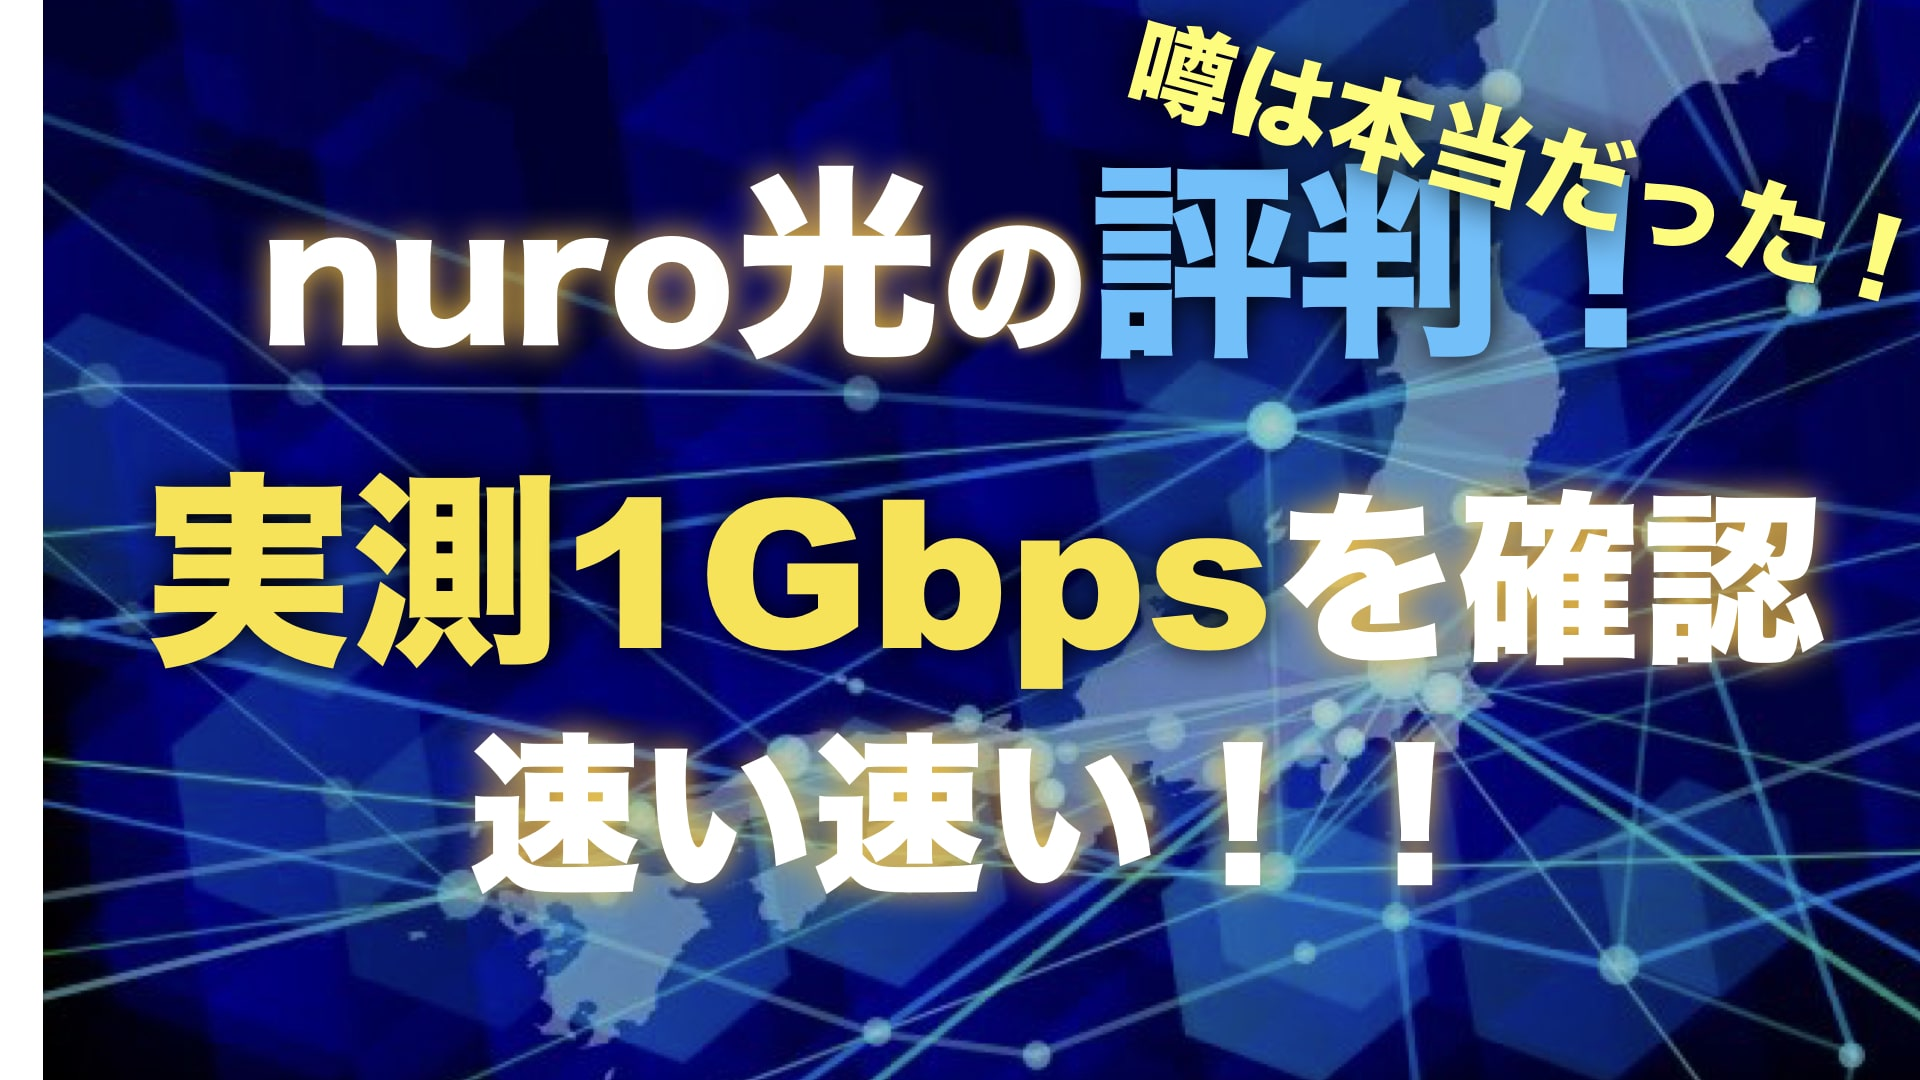 nuro光の評判!実測1Gbpsを確認!速い速い!